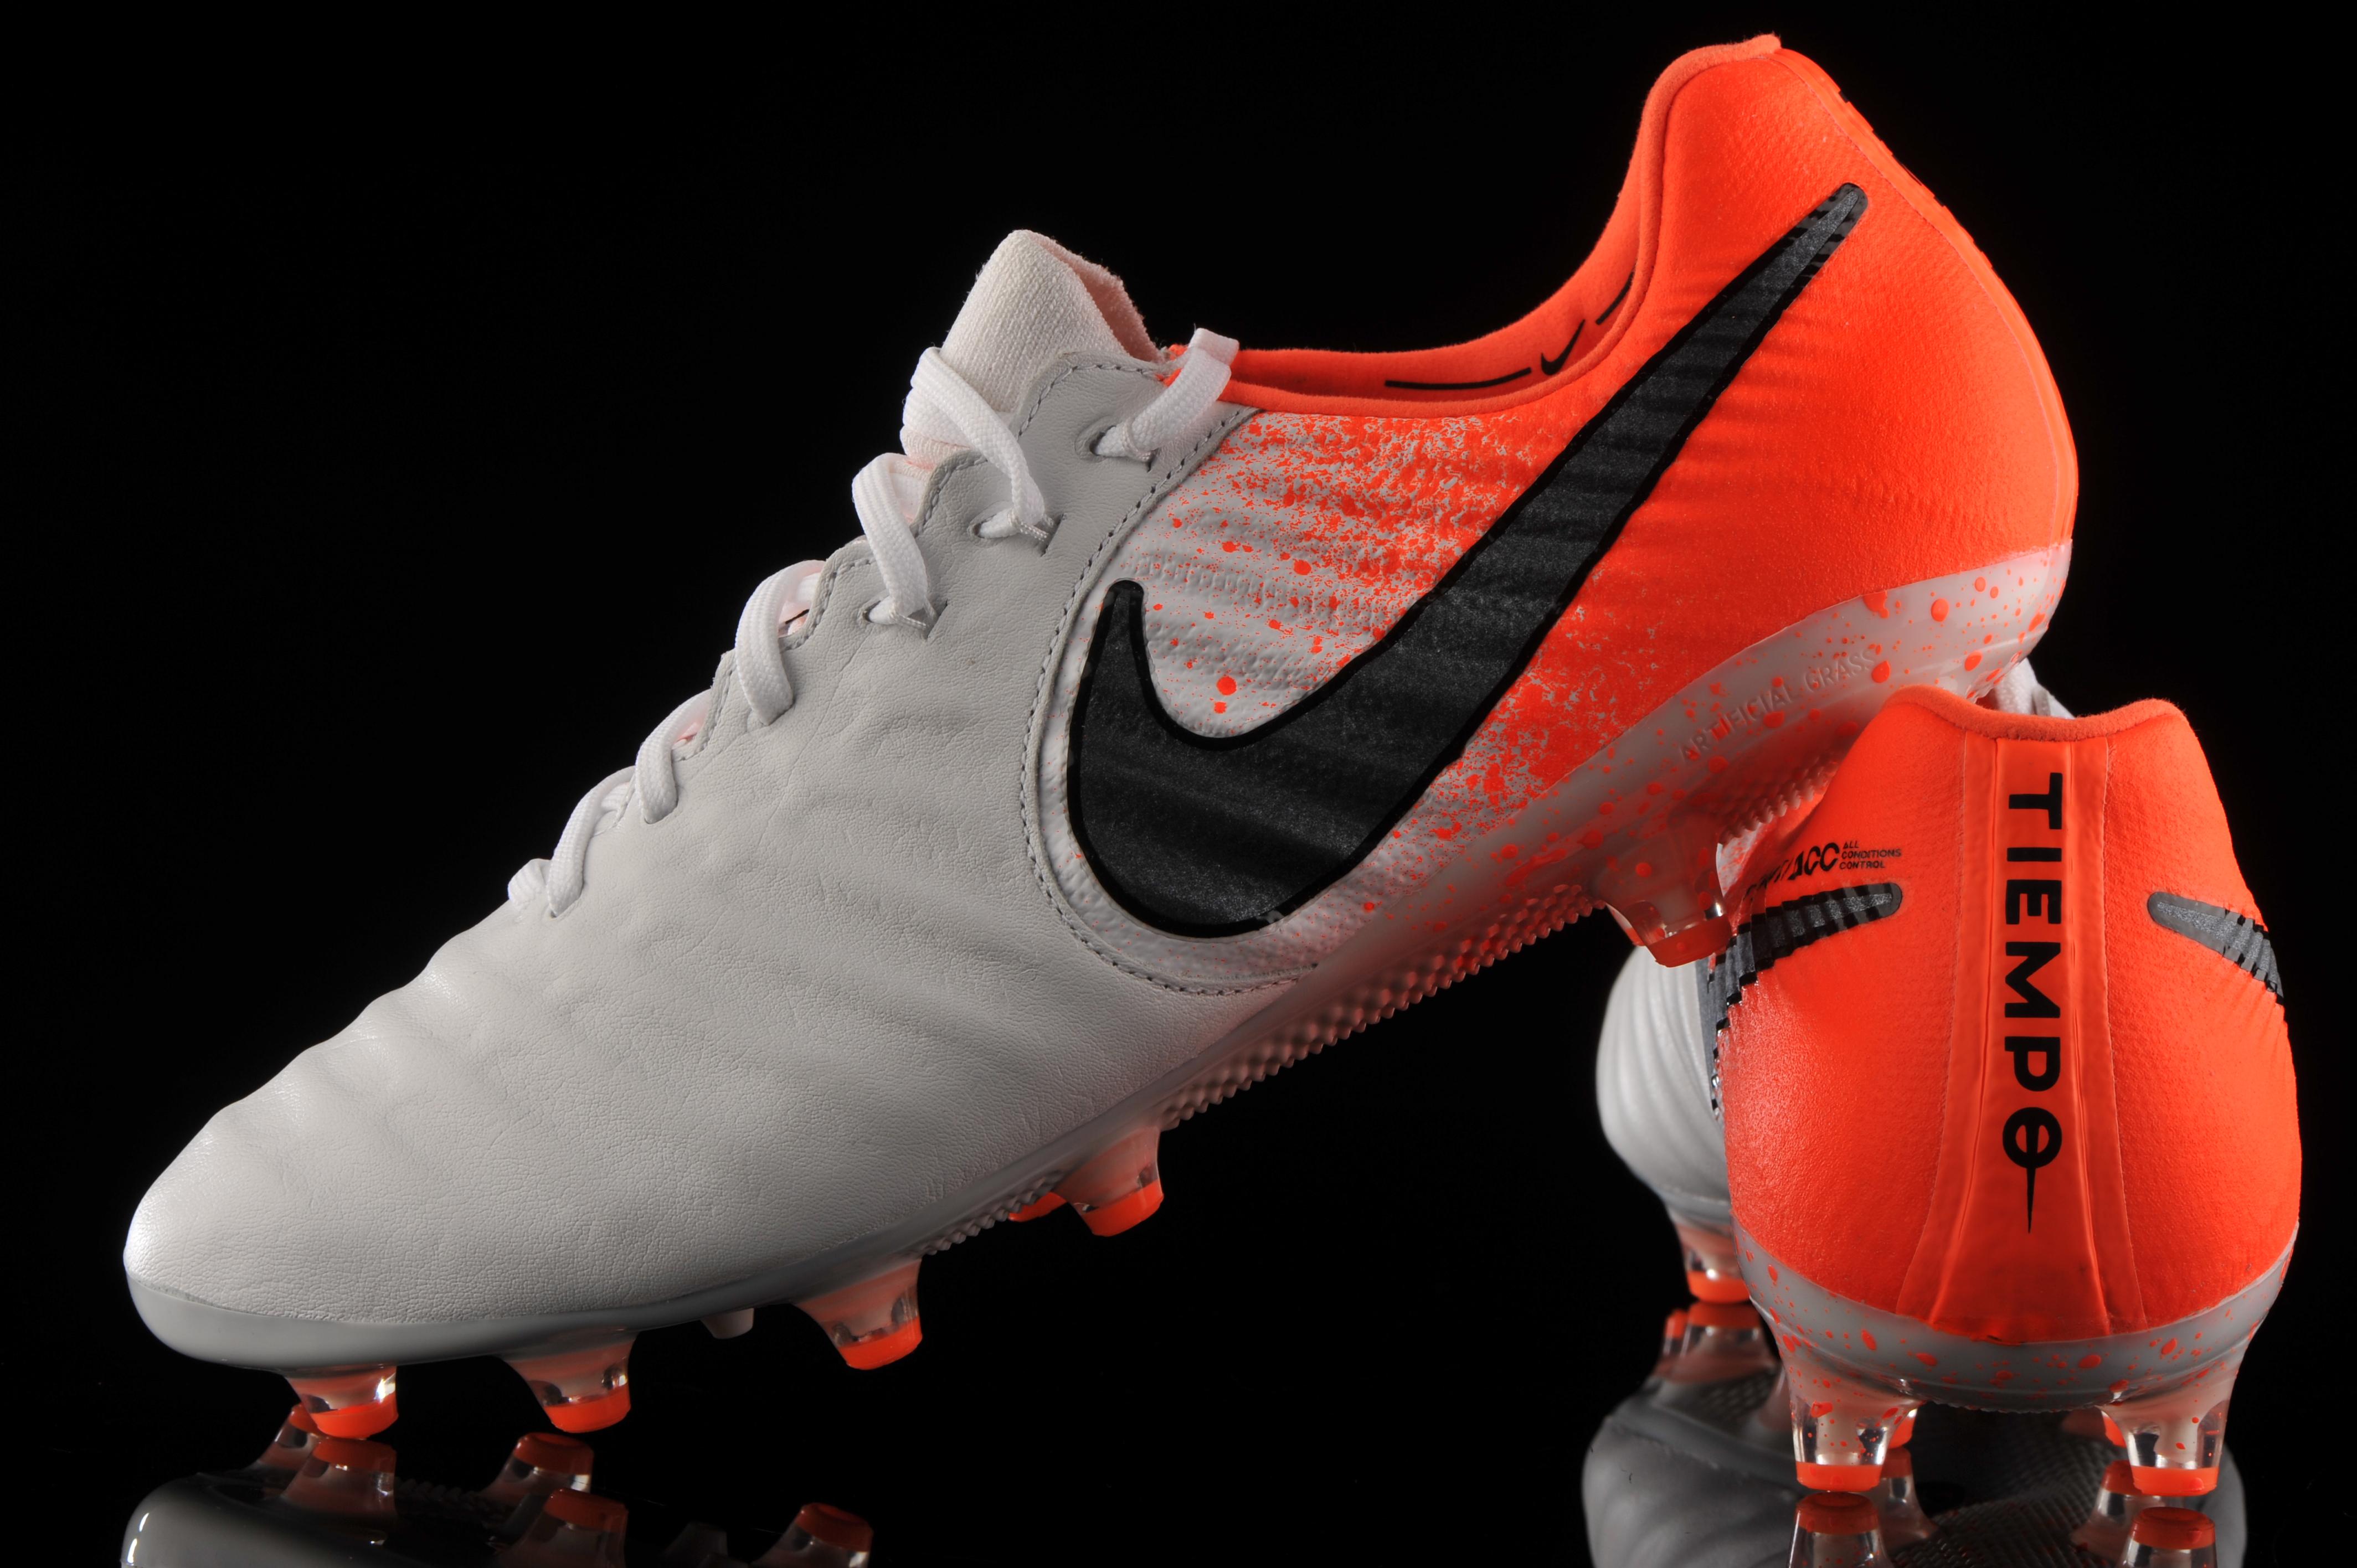 cuscús Considerar Leonardoda  Nike Tiempo Legend 7 Elite AG-PRO   R-GOL.com - Football boots & equipment